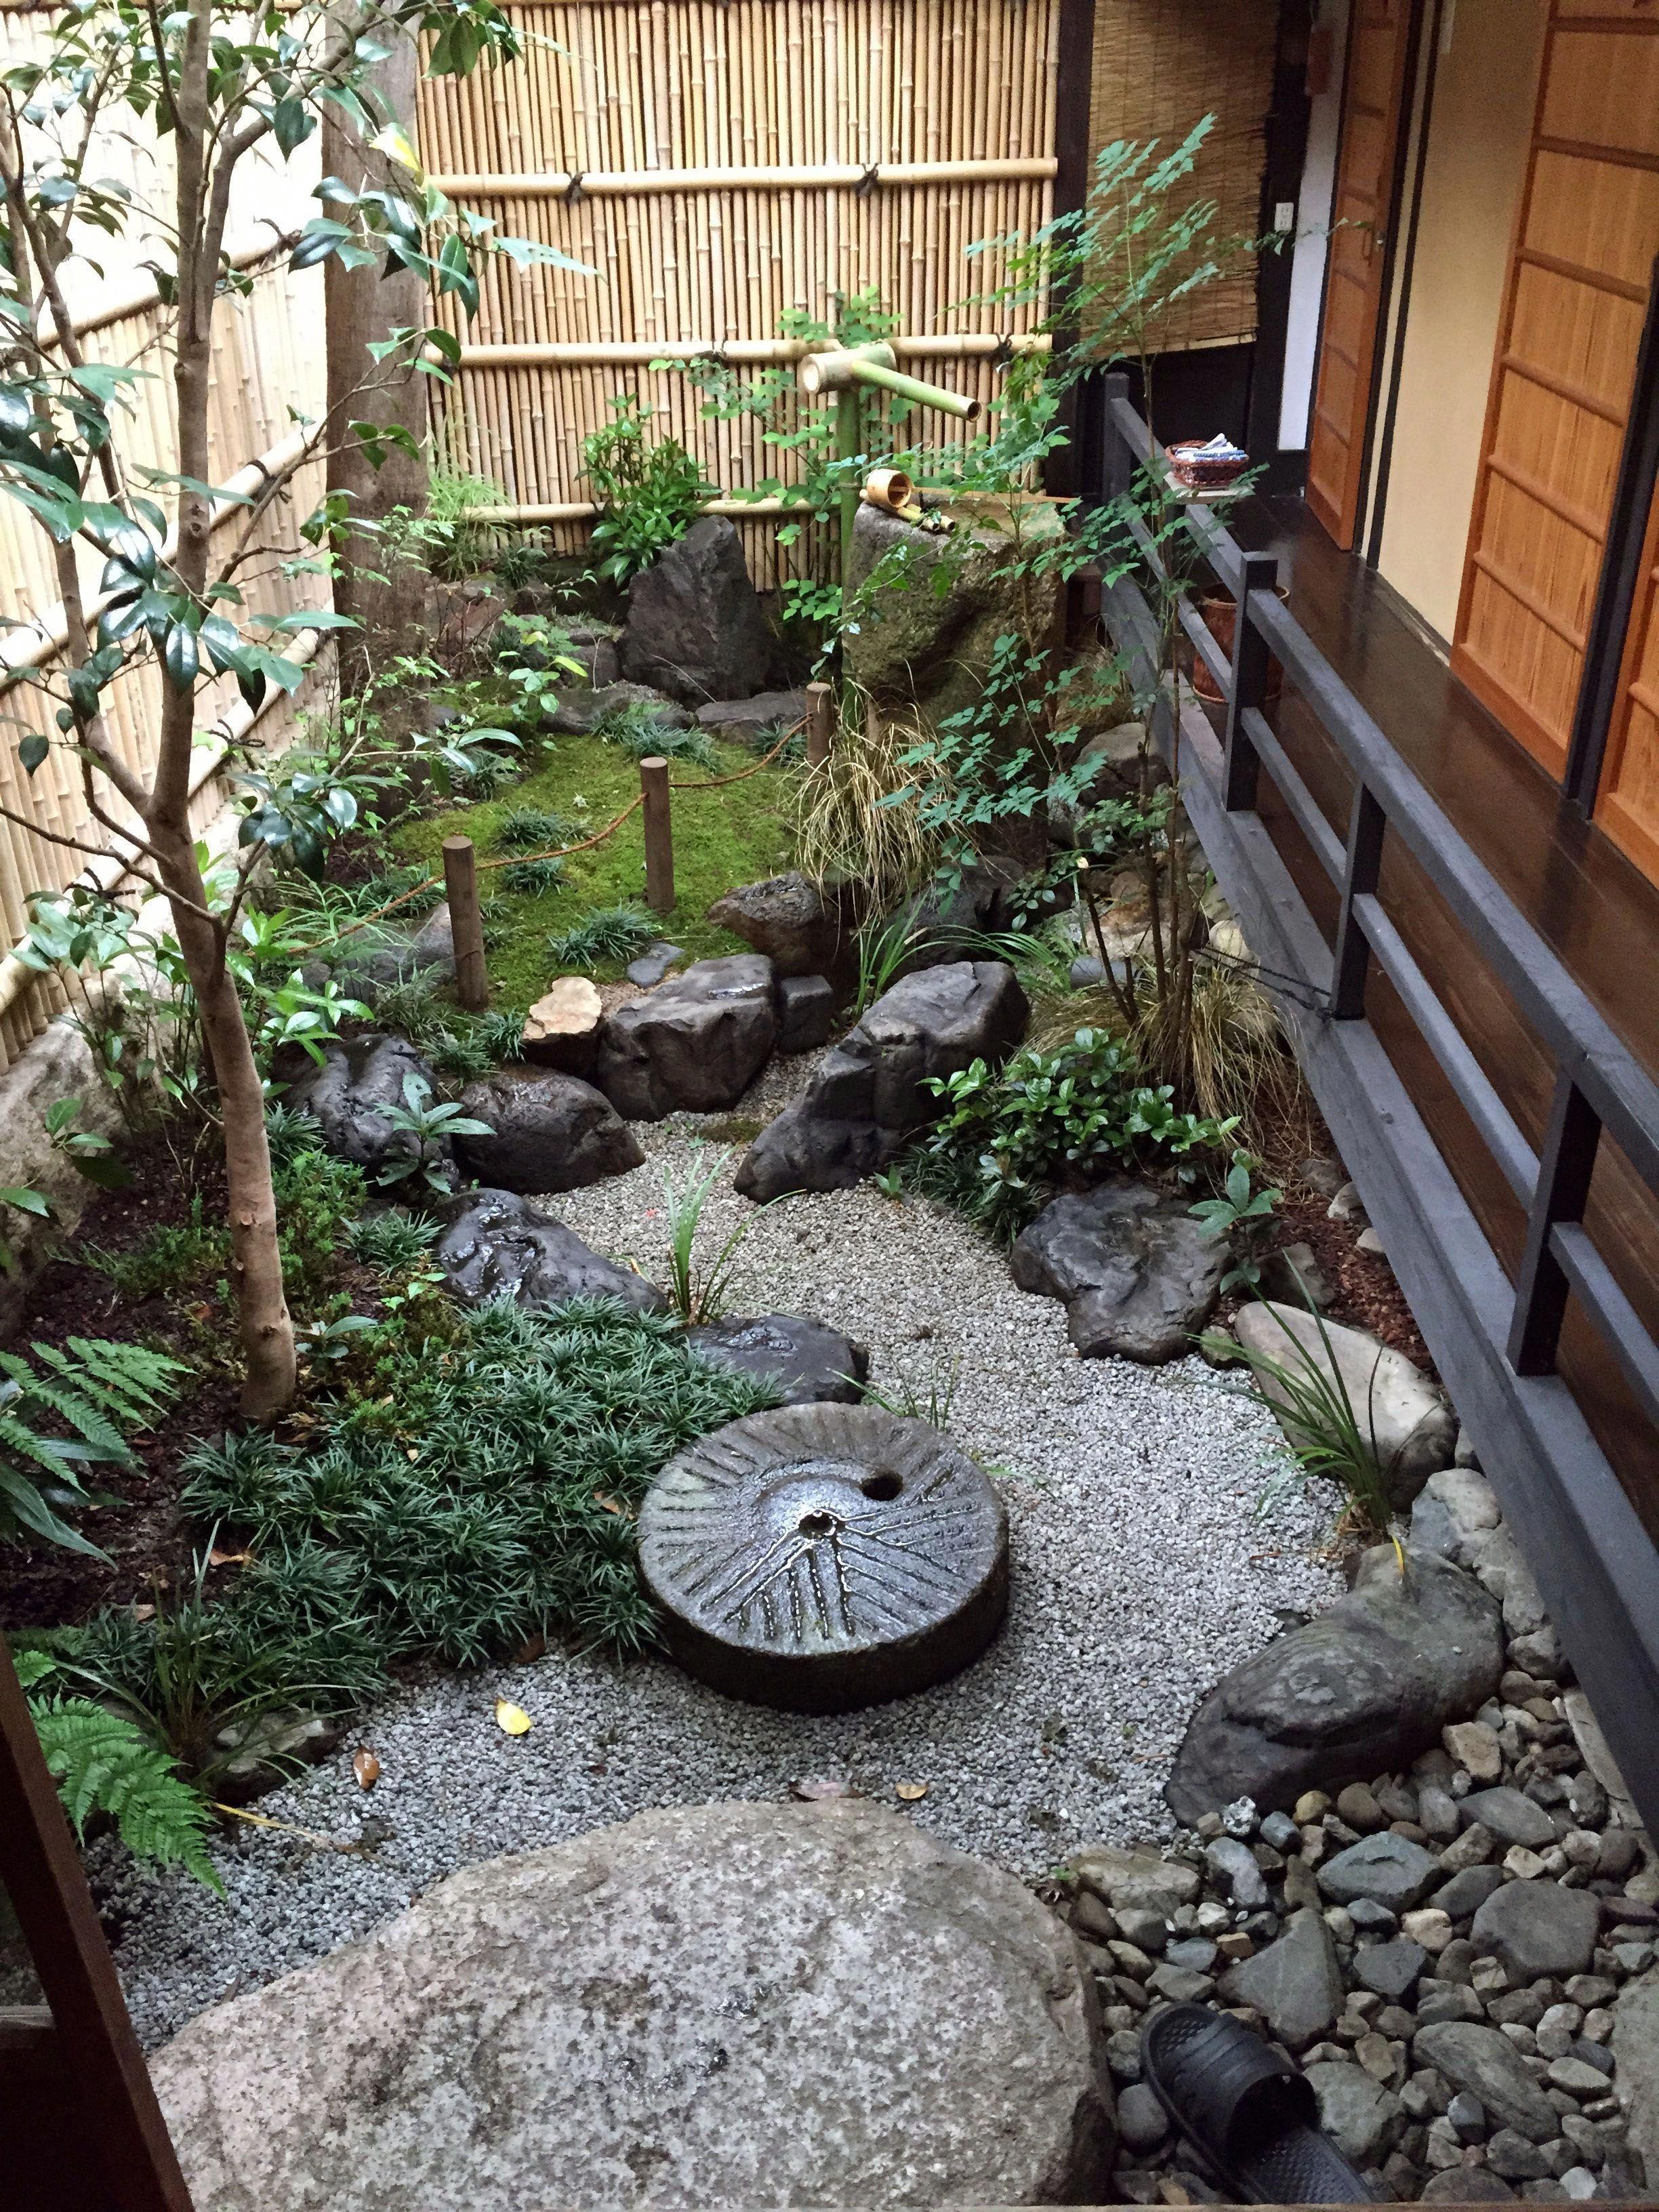 Extraordinary Tiny Japanese Garden Ideas That Will Impress You Japanesegardendesign Japanese Garden Landscape Small Japanese Garden Zen Garden Design Japanese garden for small backyard